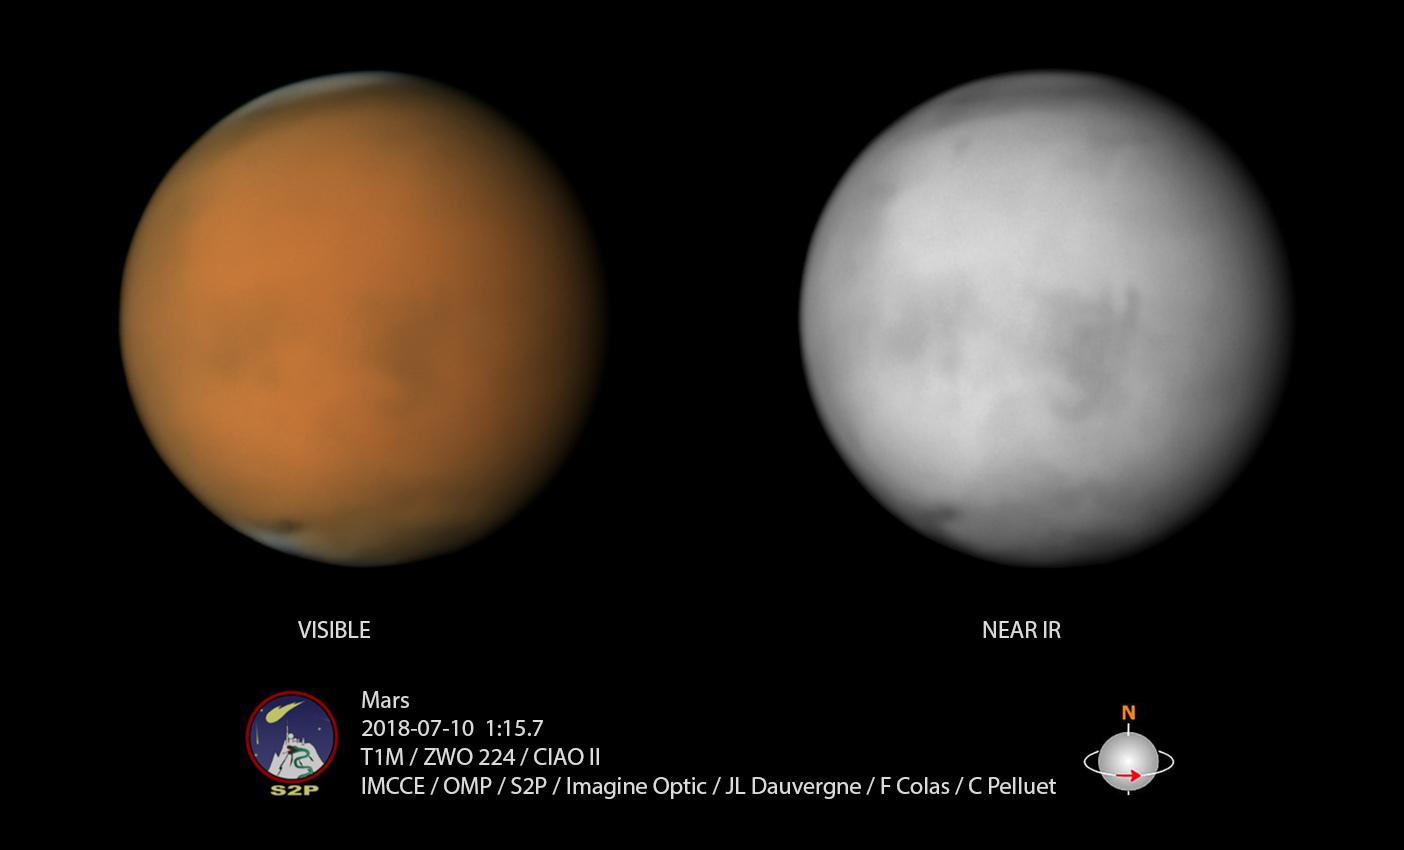 5fb04c067562e_2018-07-10-0115_7-L-Mars_ZWOASI224MC(14813640)_lapl6_ap107.jpg.76750b3e40c77d4ba336c7e9ef46118a.jpg